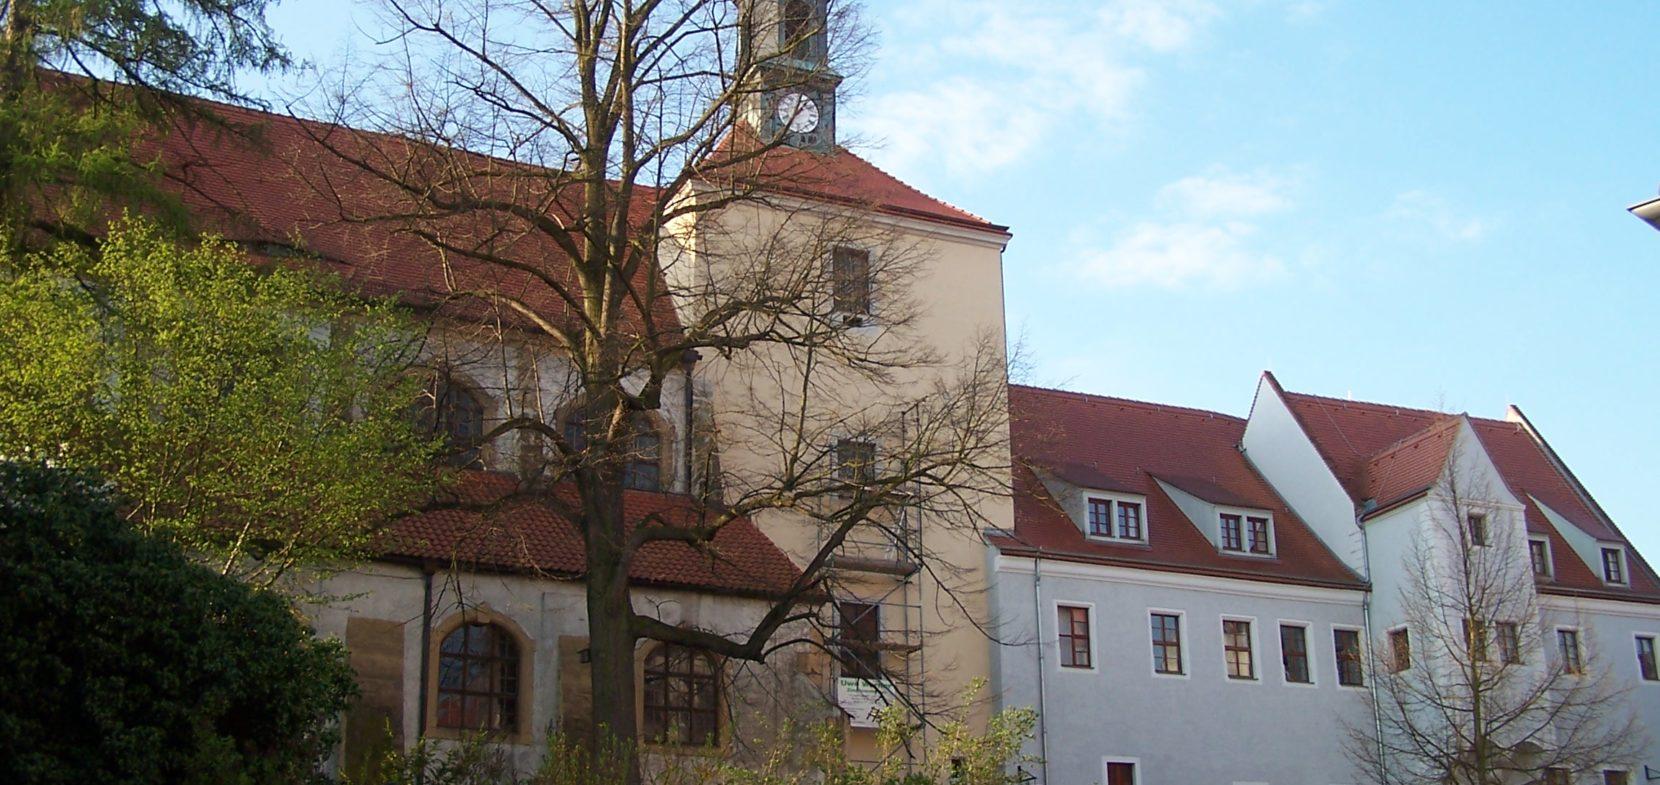 St.-Afra Klosterhof